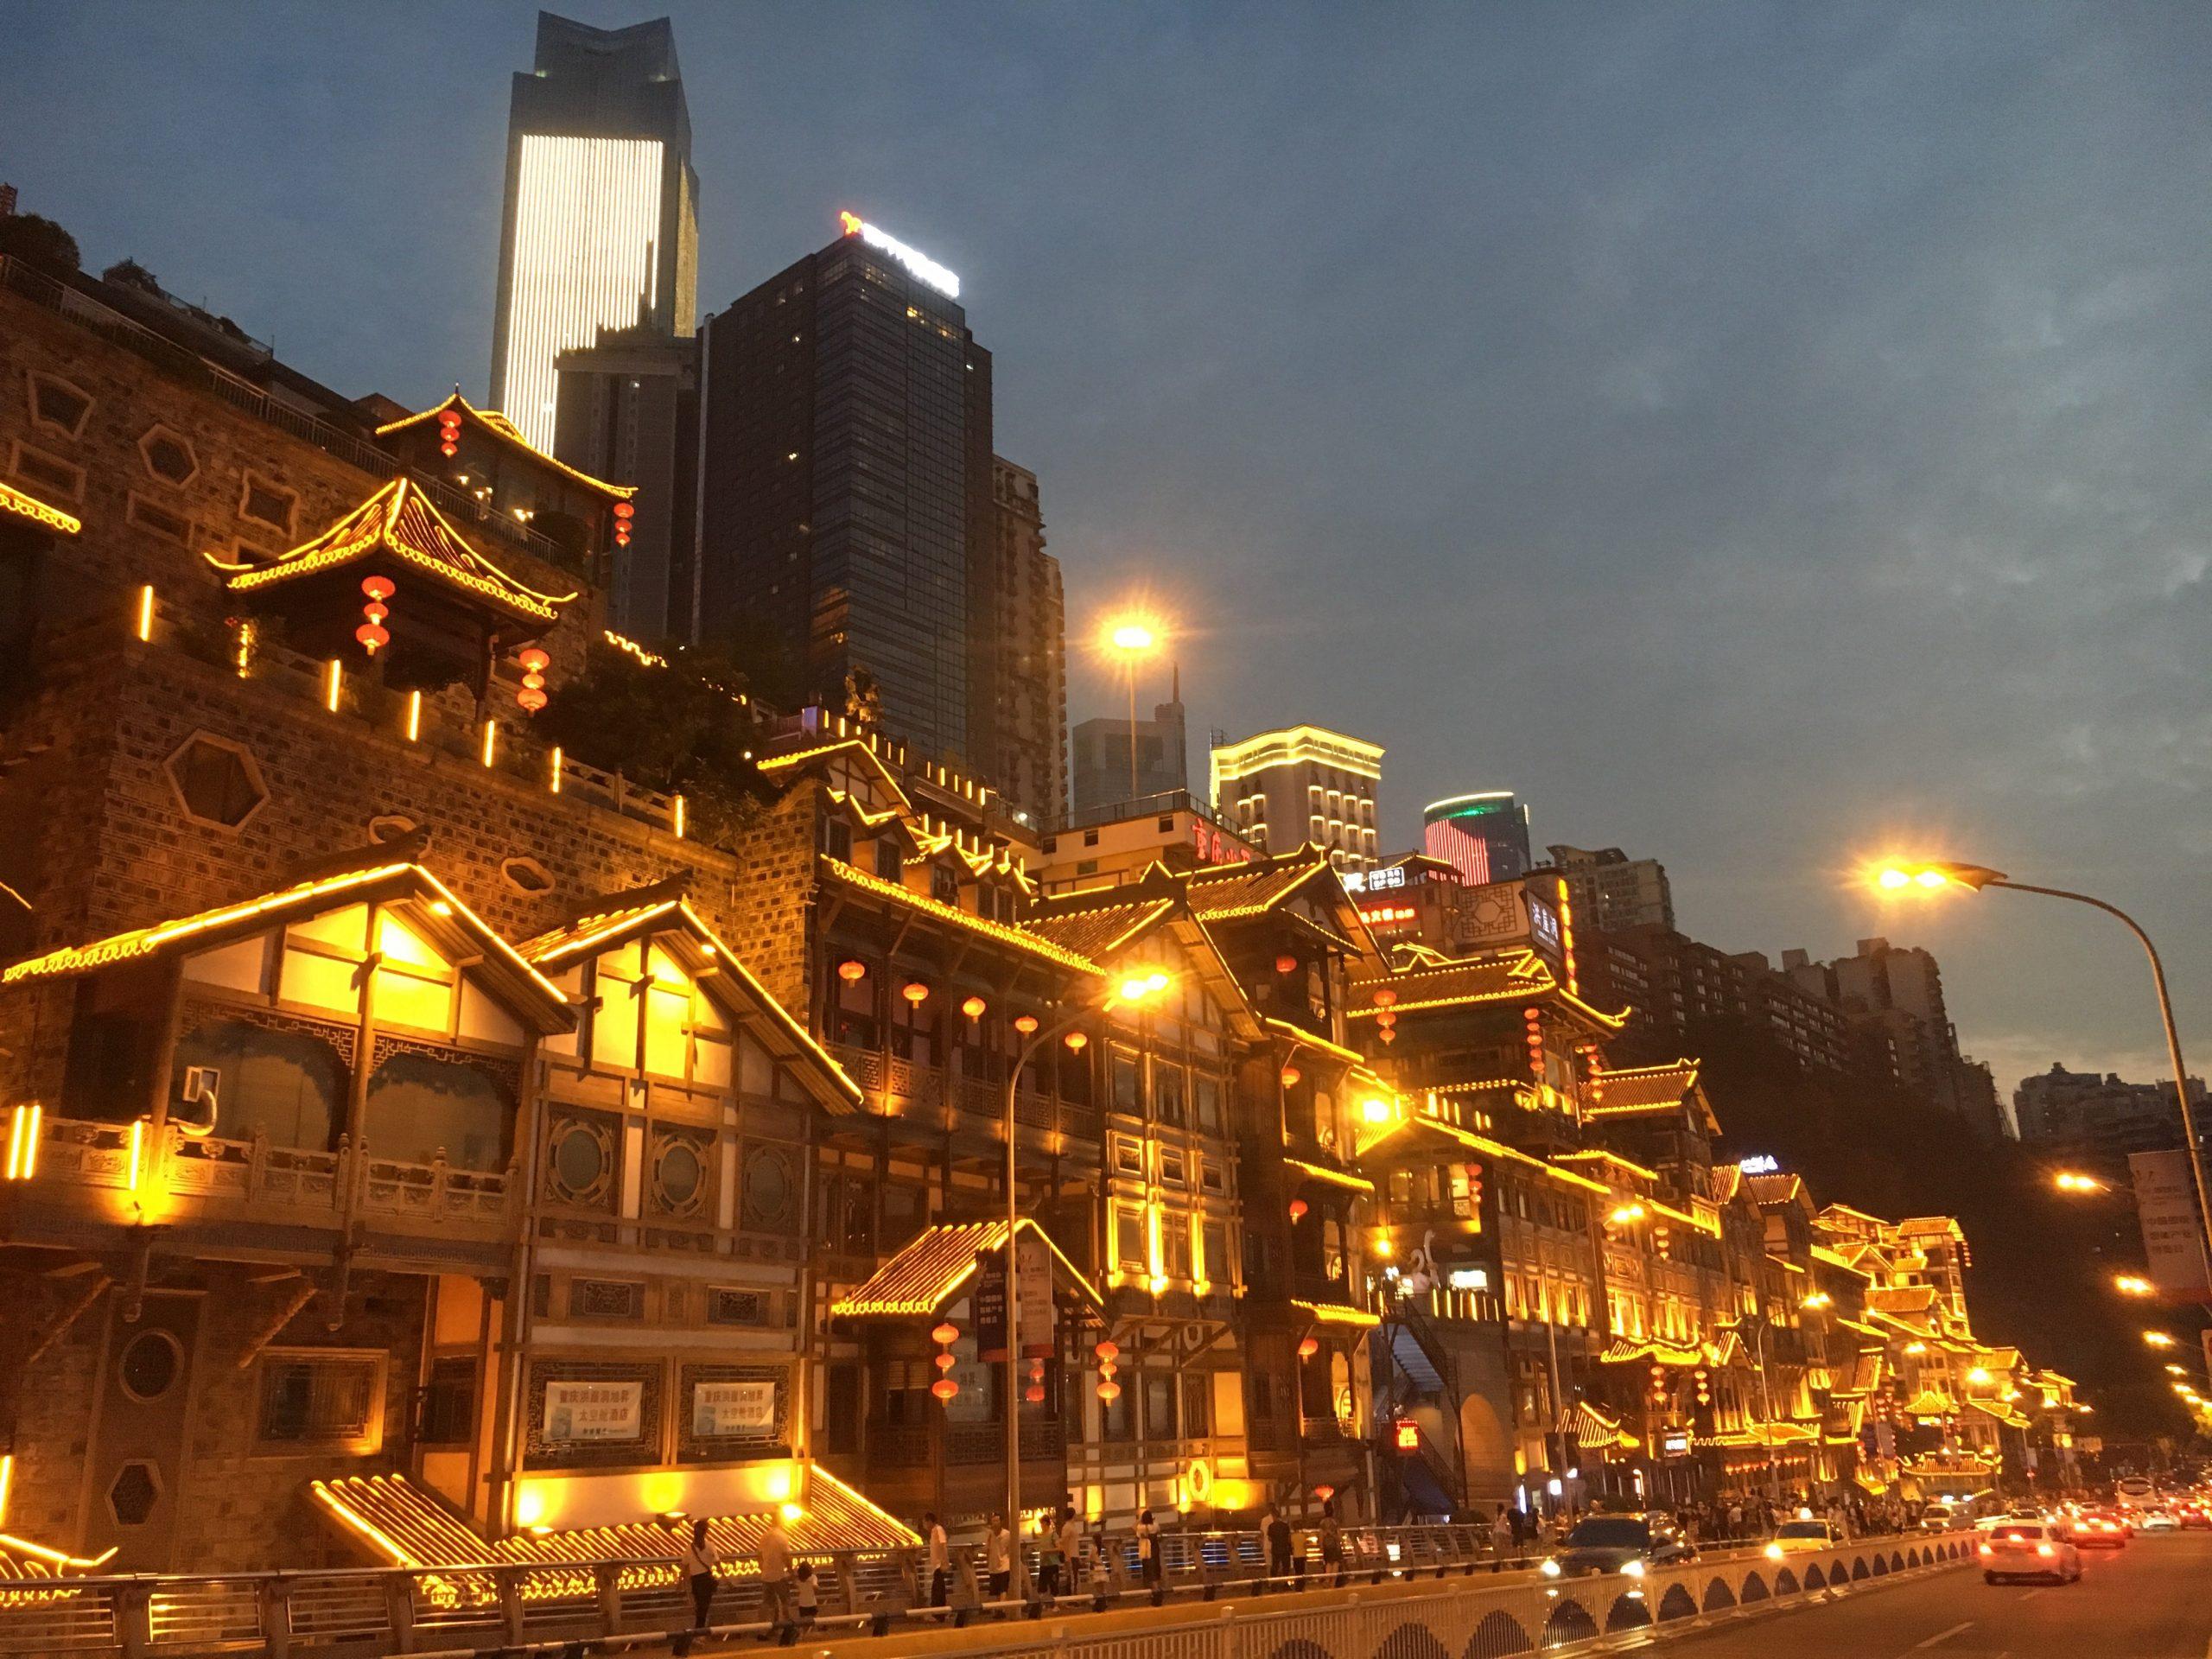 Chongqing old buildings lit up at night